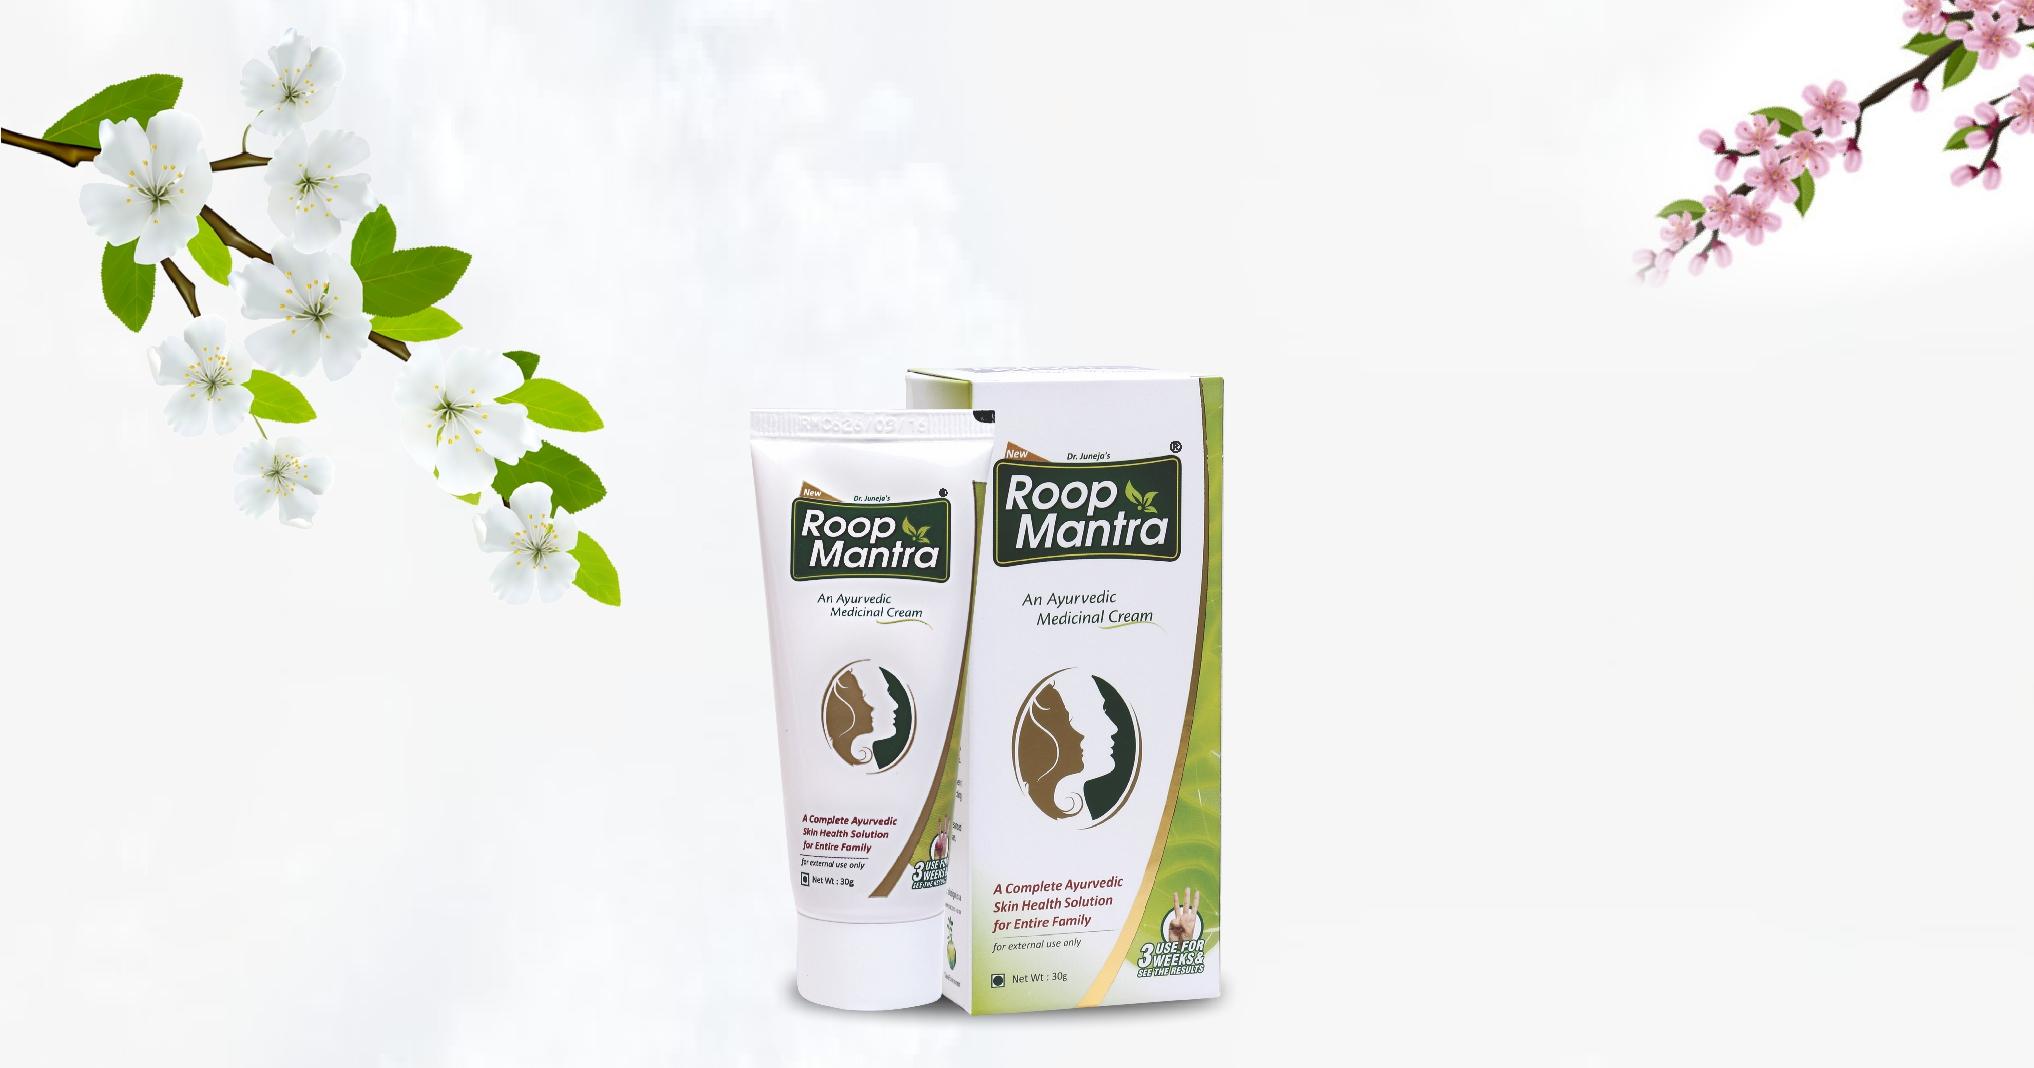 roop-mantra-ayurvedic-medicinal-cream-Help-You-Get-a-Younger-Looking-Skin